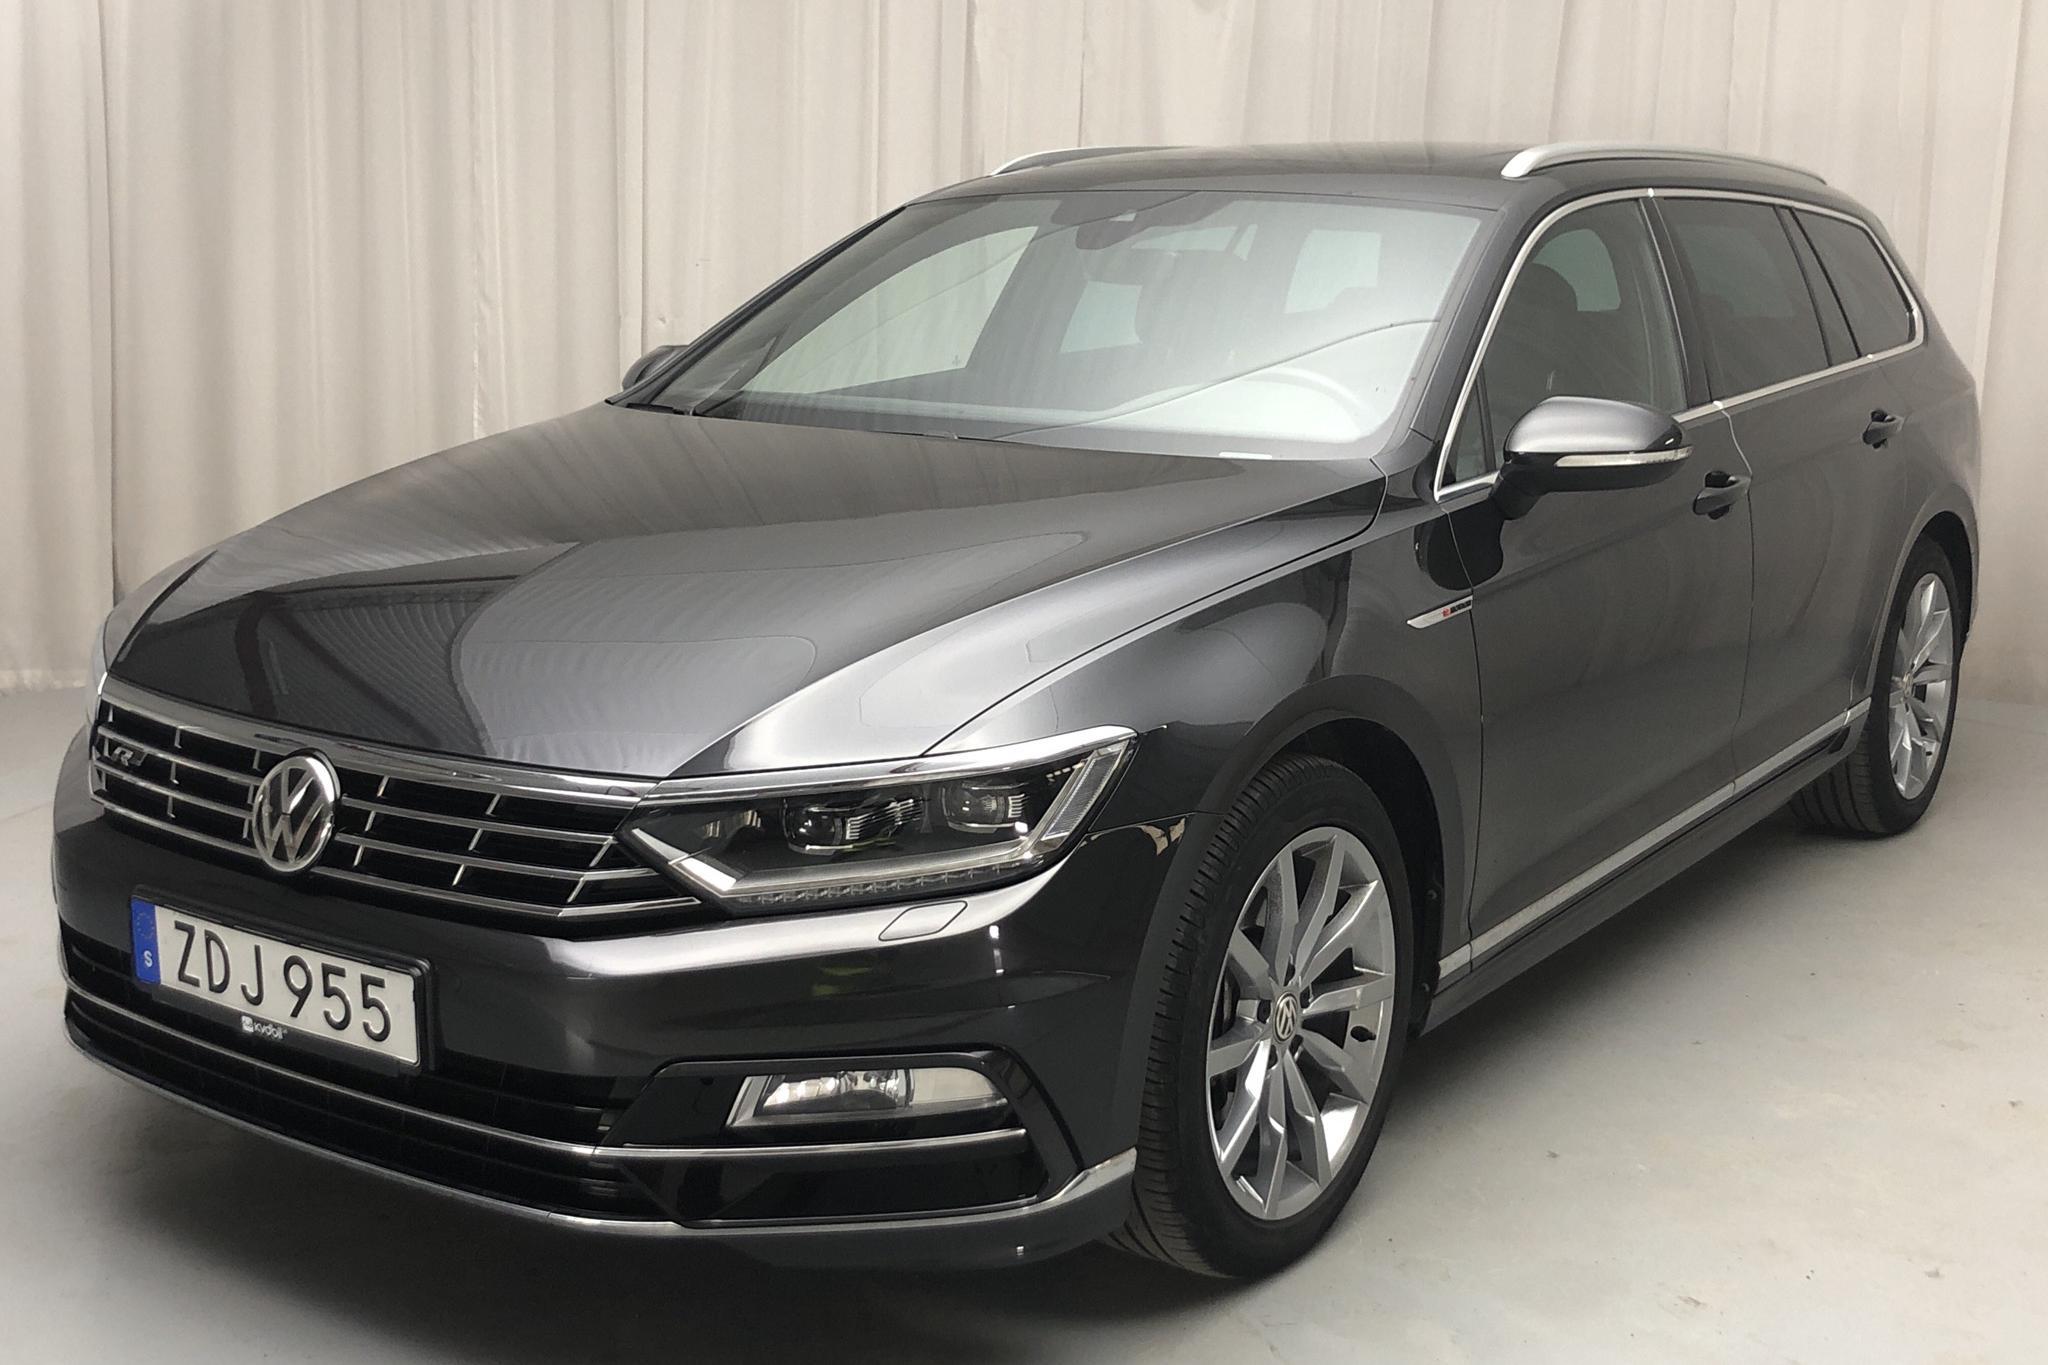 VW Passat GTR Sportscombi 4MOTION (280hk) - 52 000 km - Automatic - Dark Grey - 2018